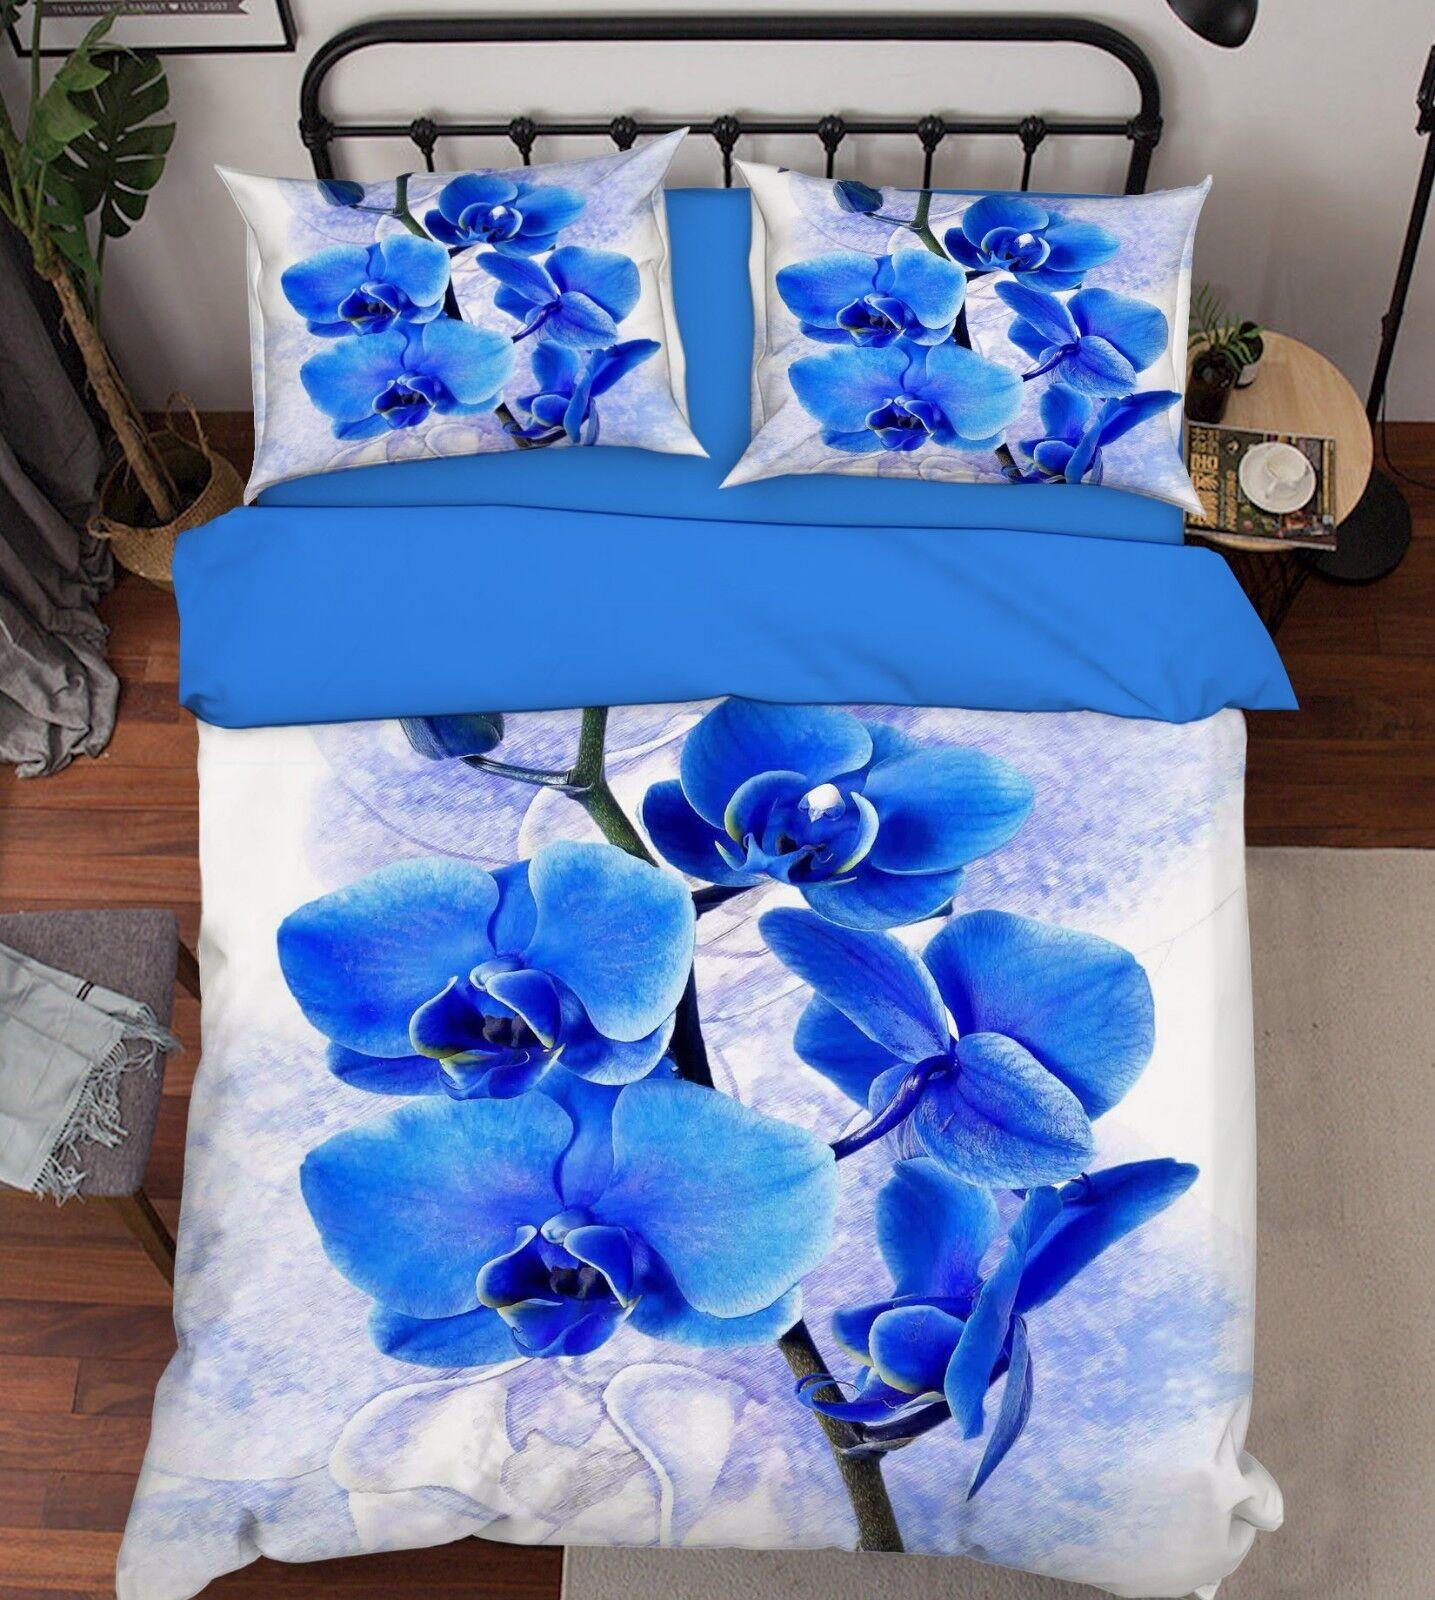 3d Blau Floral 363 bett Cushion abdeckungs Stitch Duvet abdeckung Set Single Queen DE